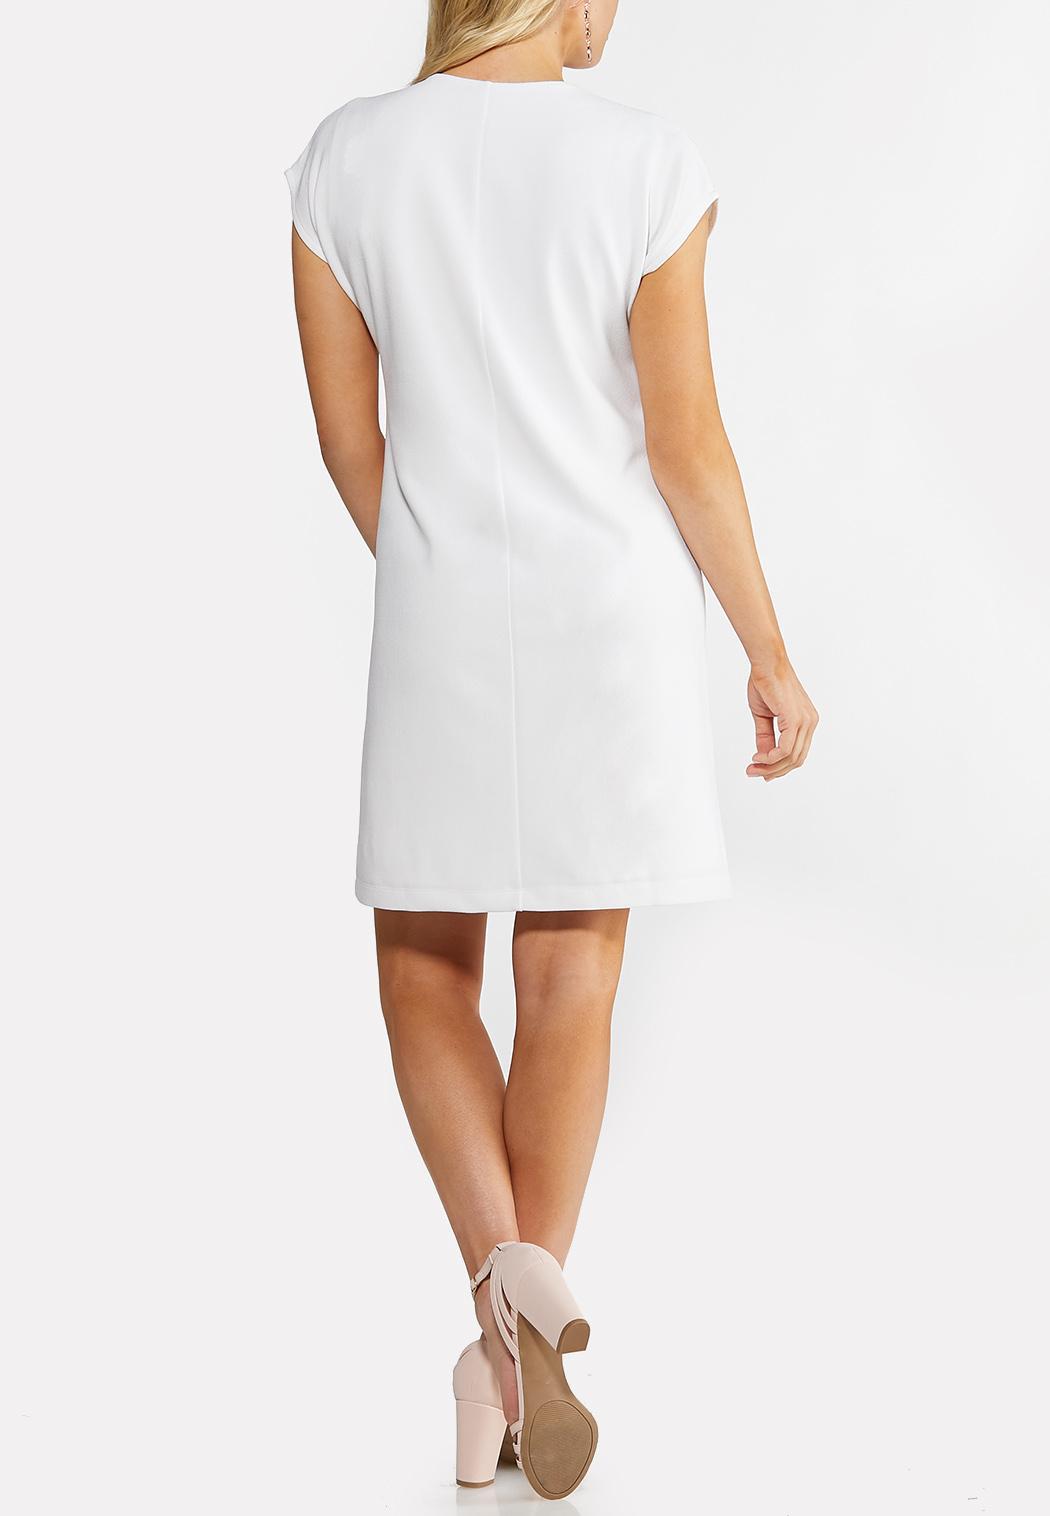 11f6e9b9ab0 Plus Size White Puff Print Shift Dress Plus Sizes Cato Fashions